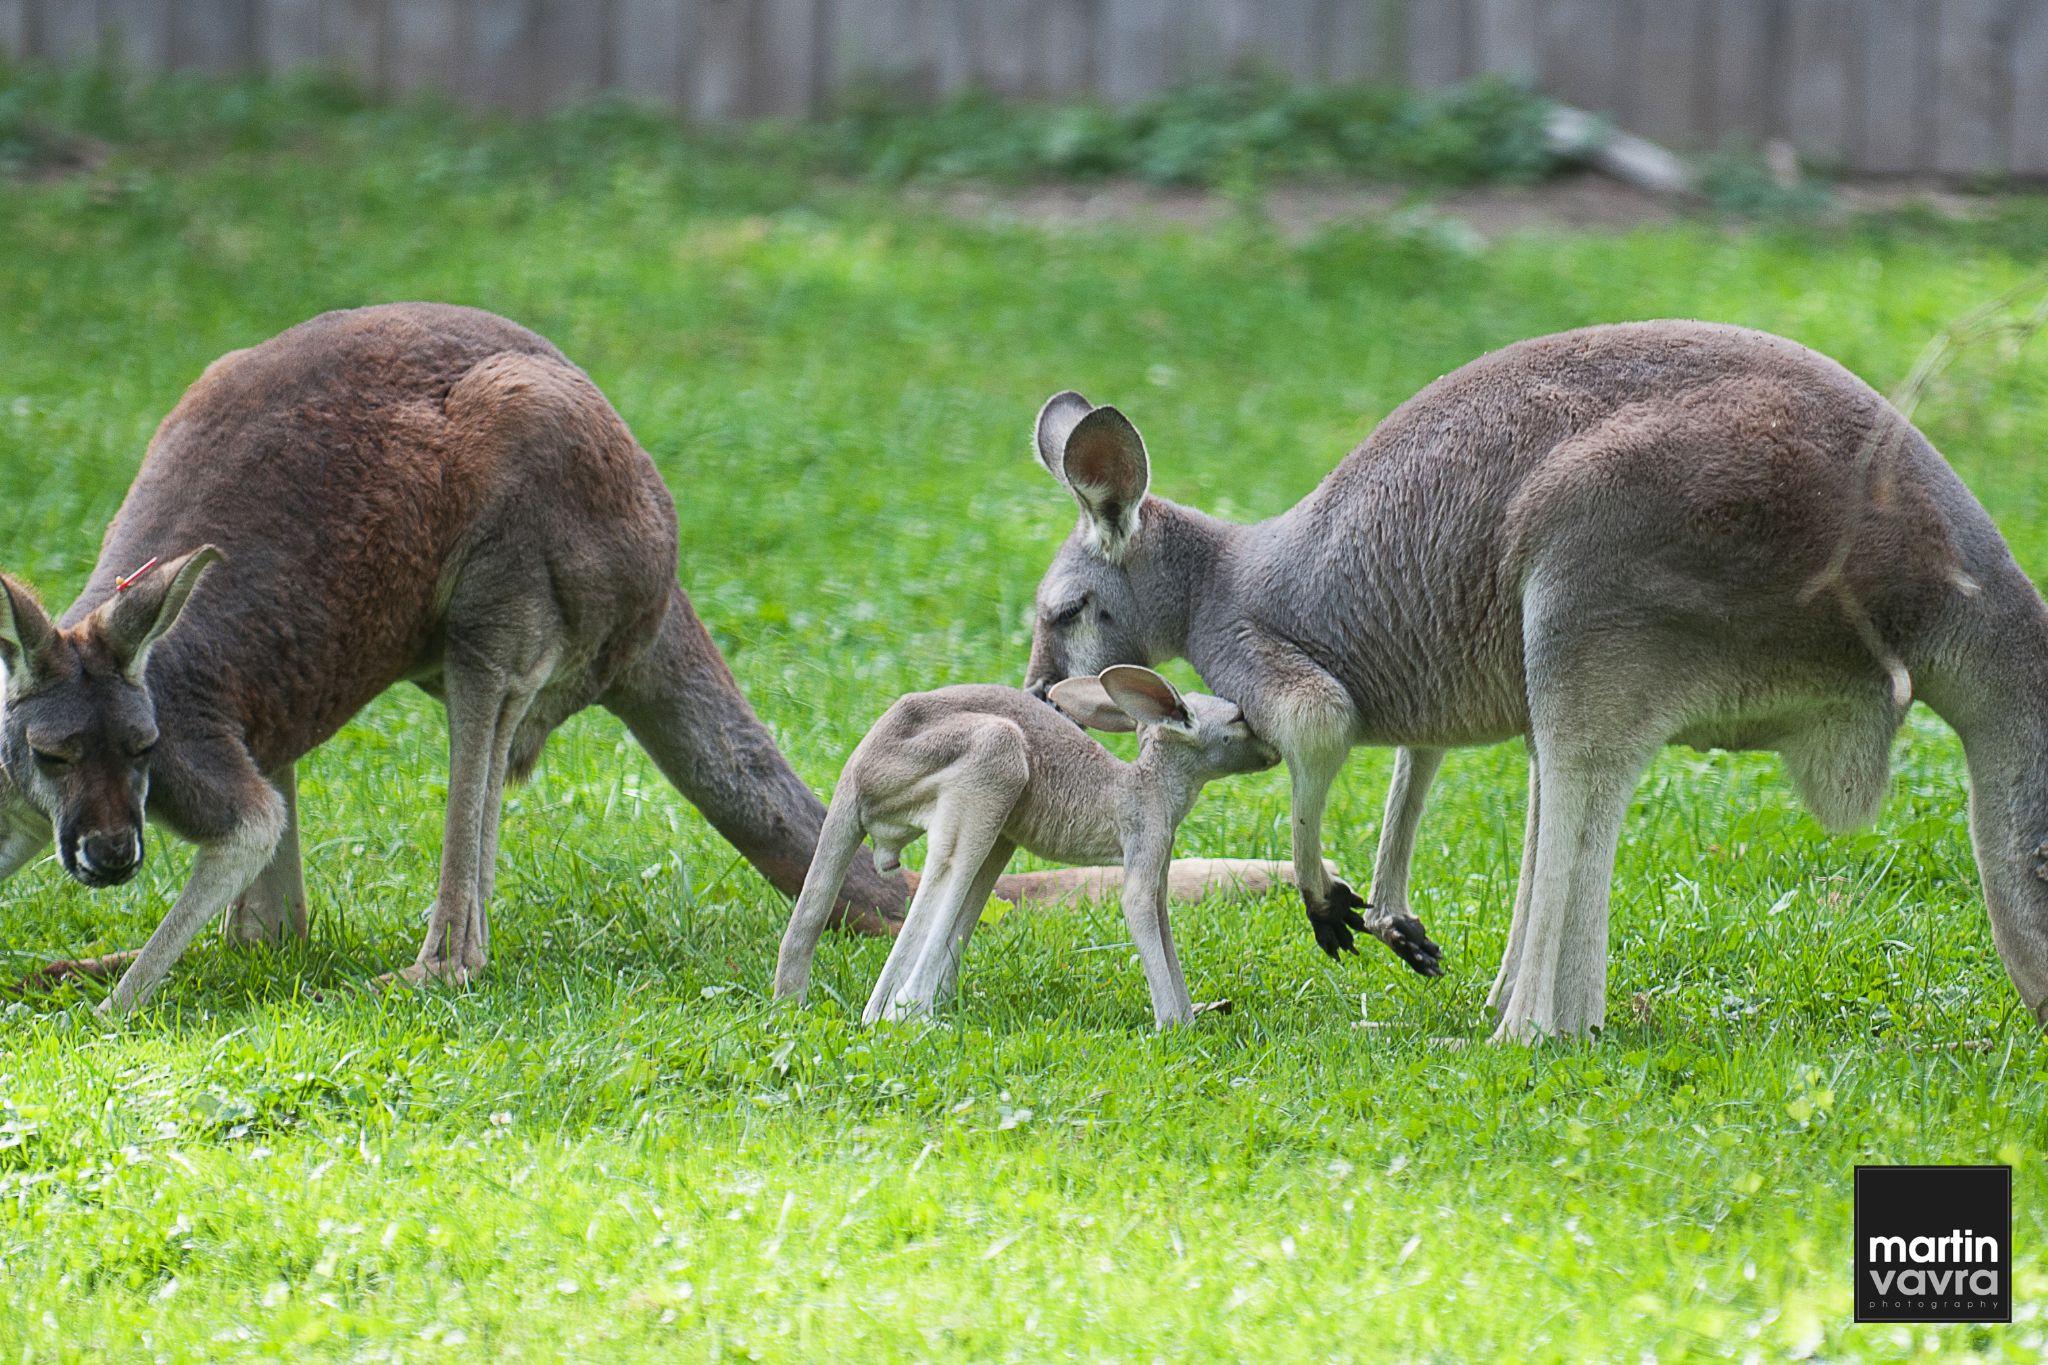 Baby kangaroo at the Detroit Zoo by martin.vavra.330